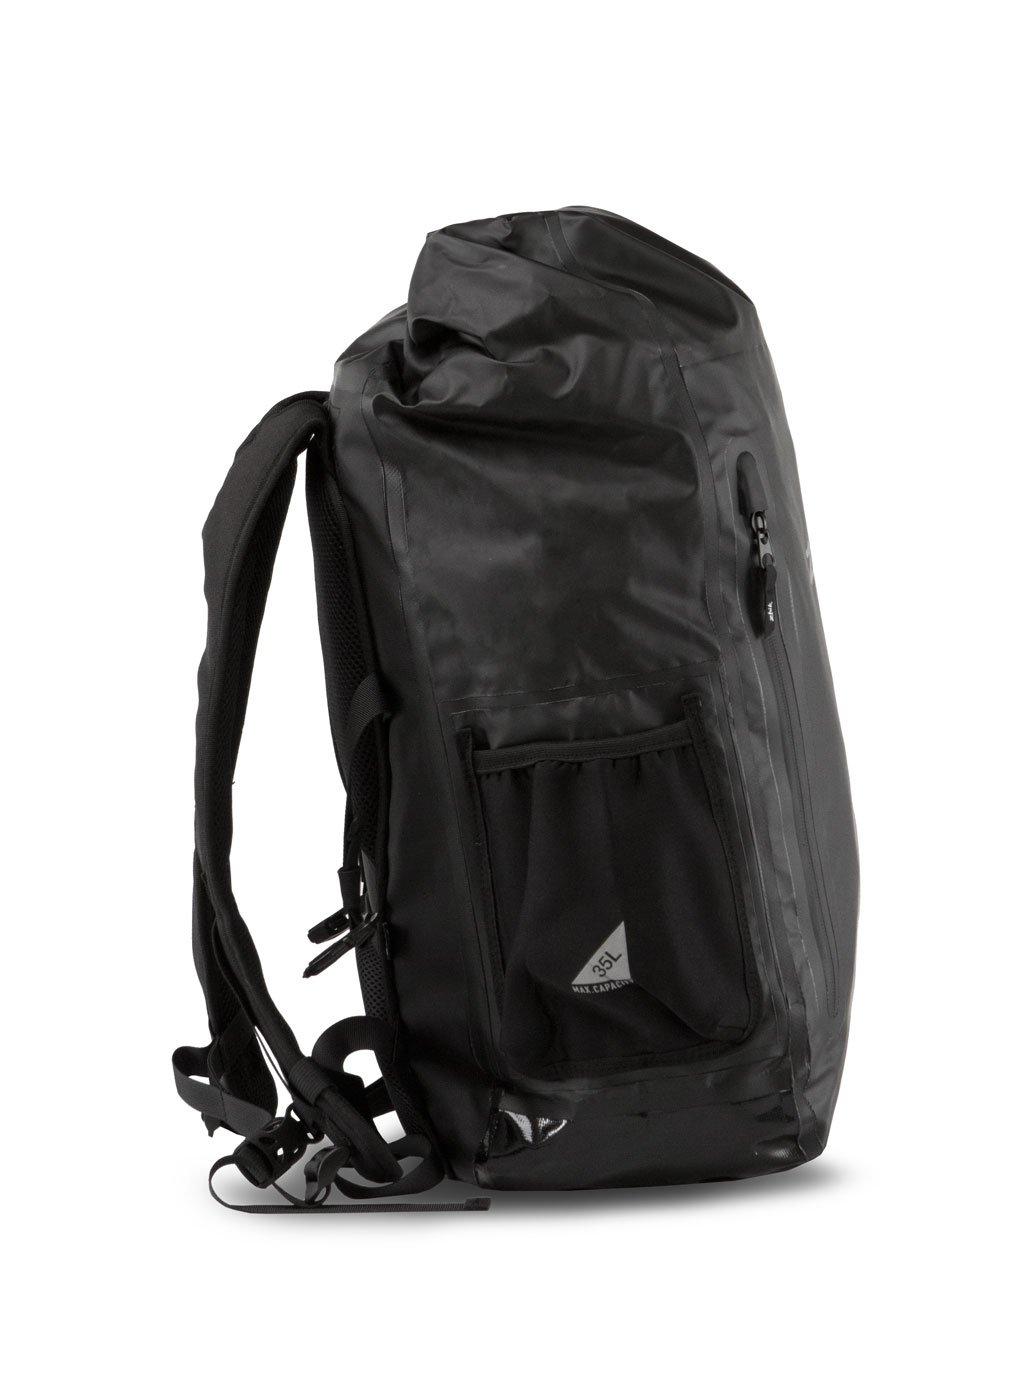 Amazon.com   Zhik Dry Backpack 35L BLACK   Sports   Outdoors 5feff38649181